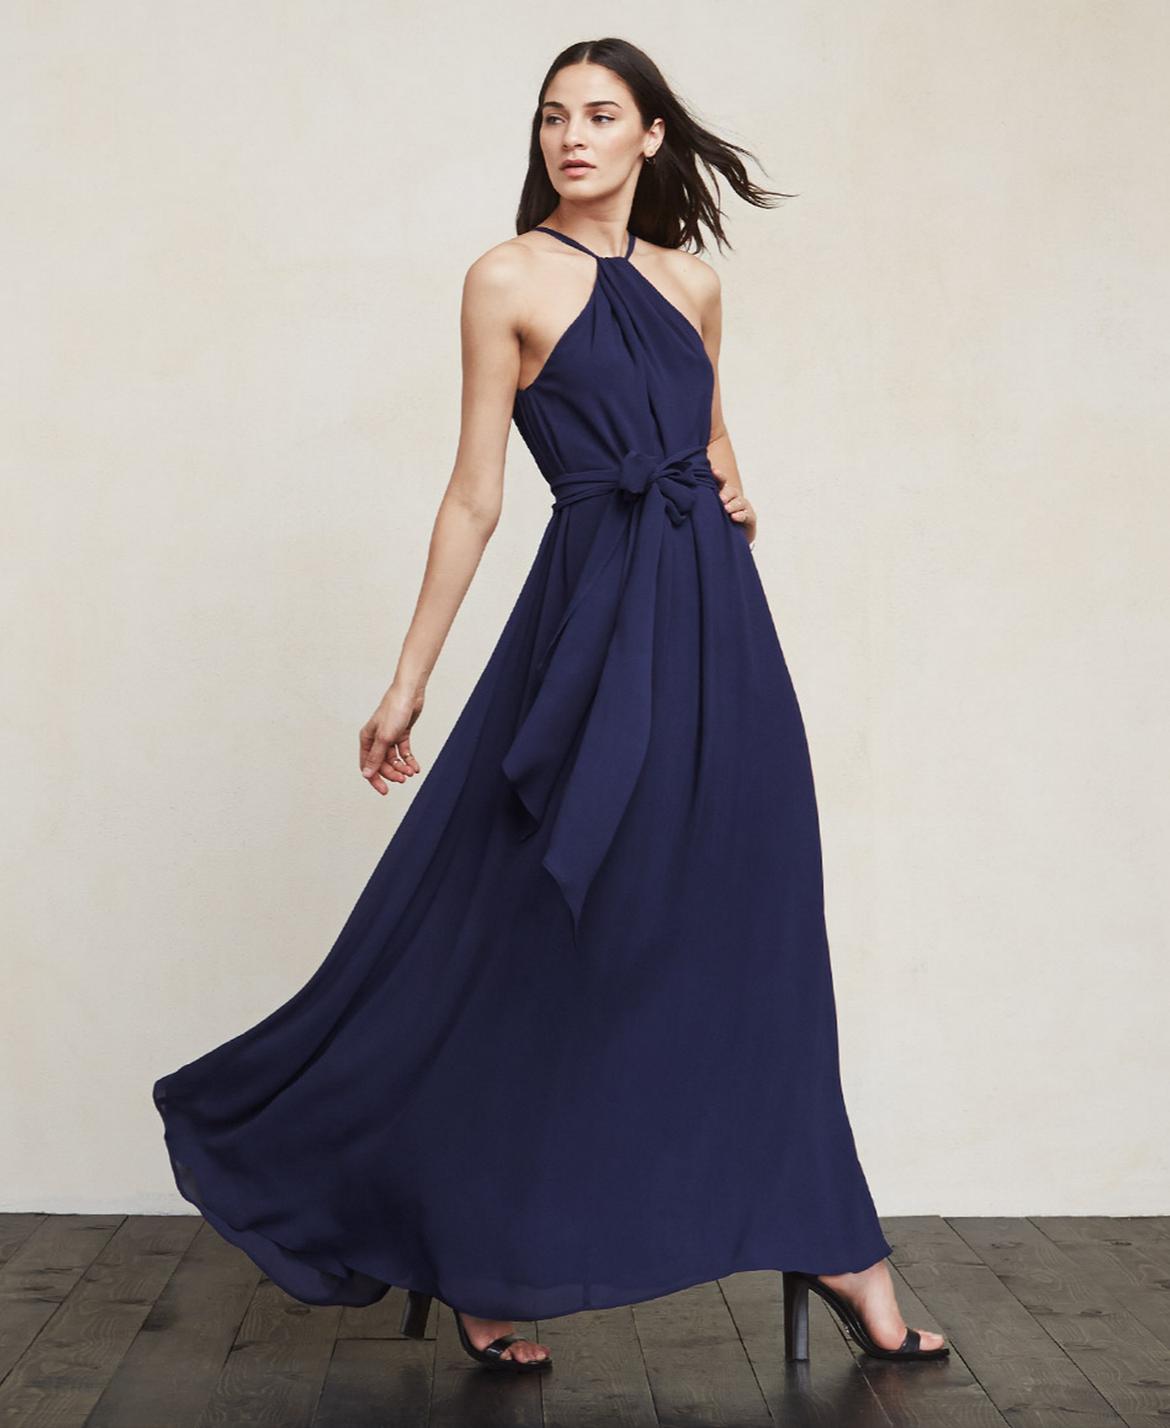 1047053e26 Reformation navy georgette halter neck bridesmaid dress